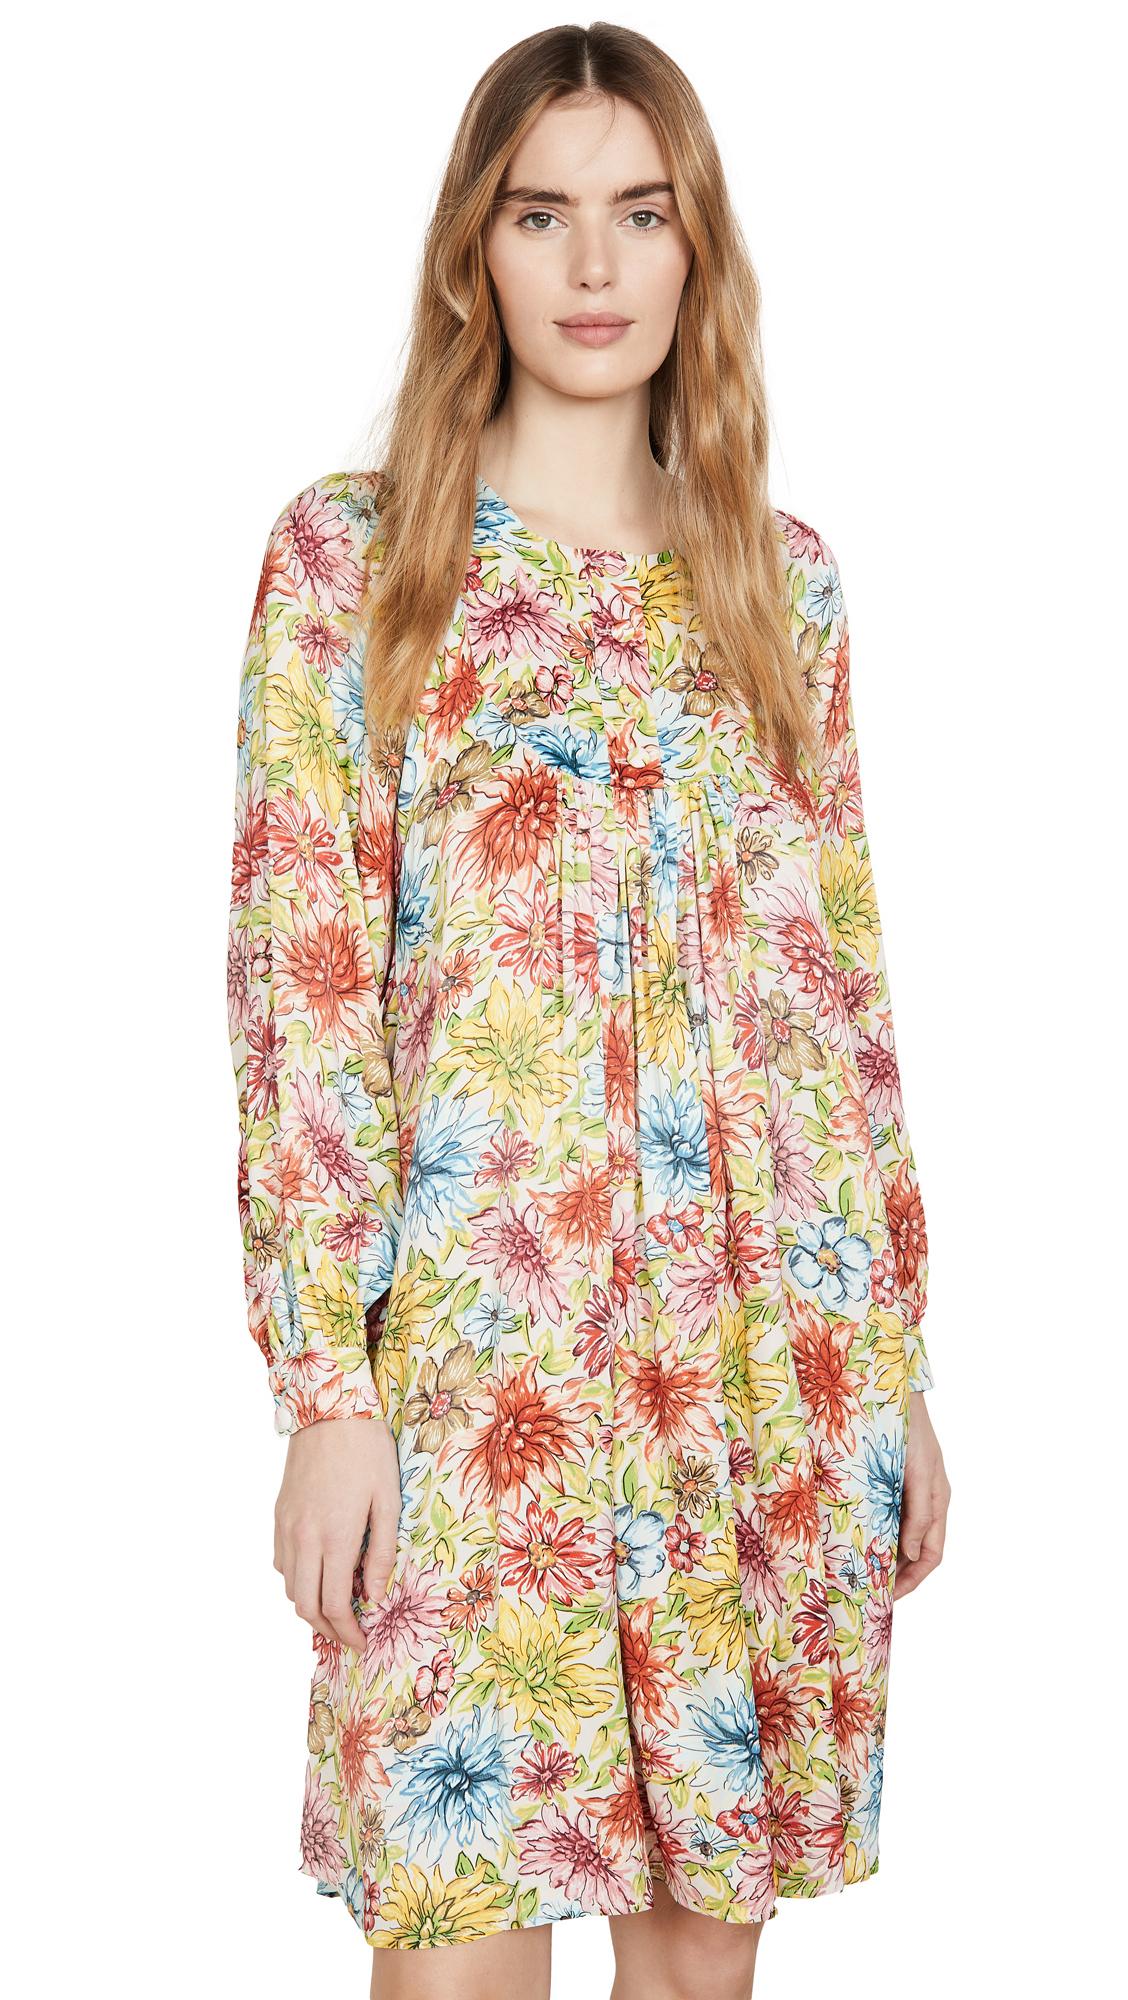 ALEXACHUNG Floral Batwing Dress - 60% Off Sale